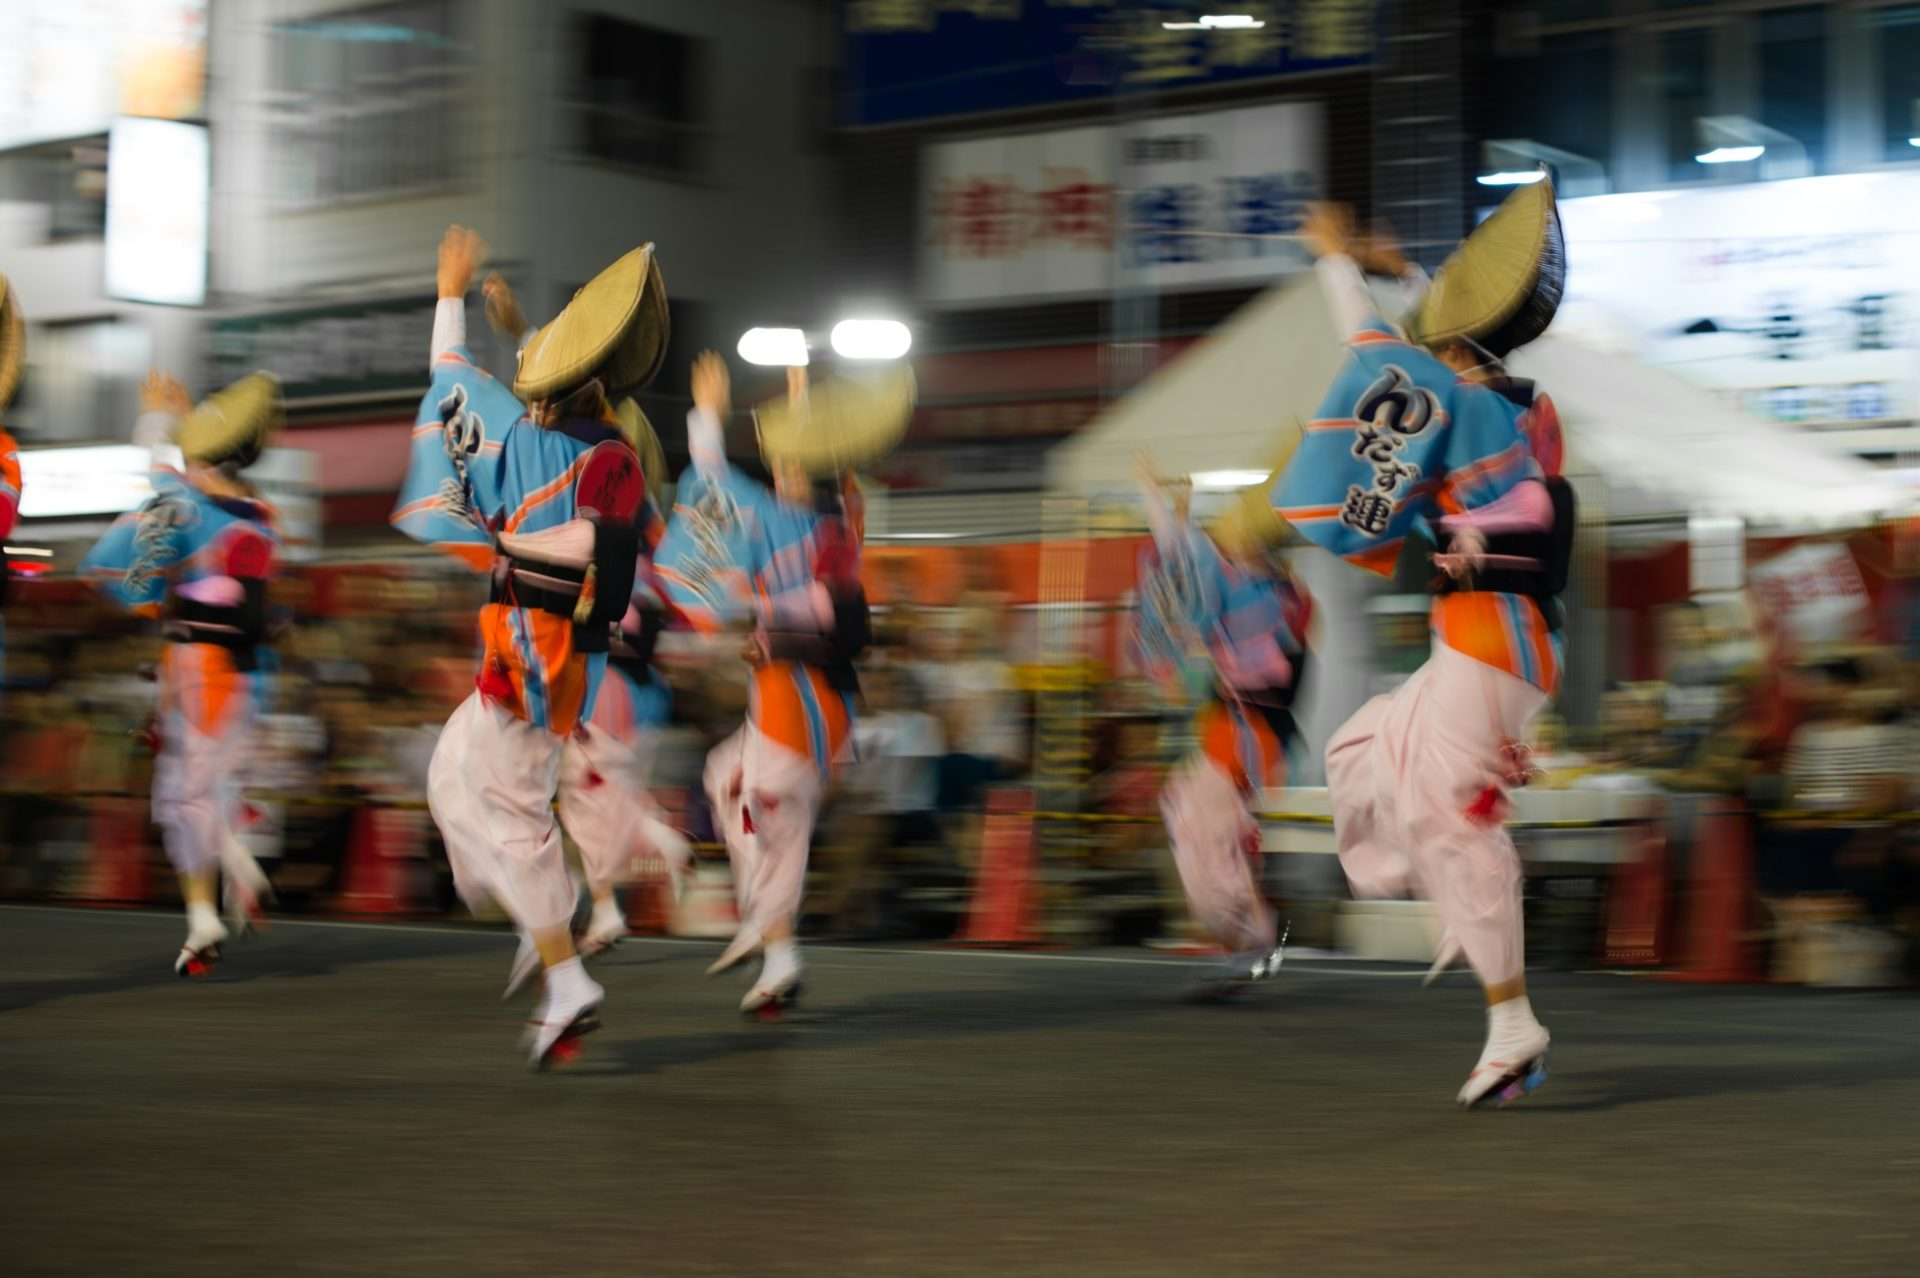 Koenjin Awa-odori-juhlan tanssijoita. Kuva: Takashi Hososhima, flickr.com, CC BY-SA 2.0.